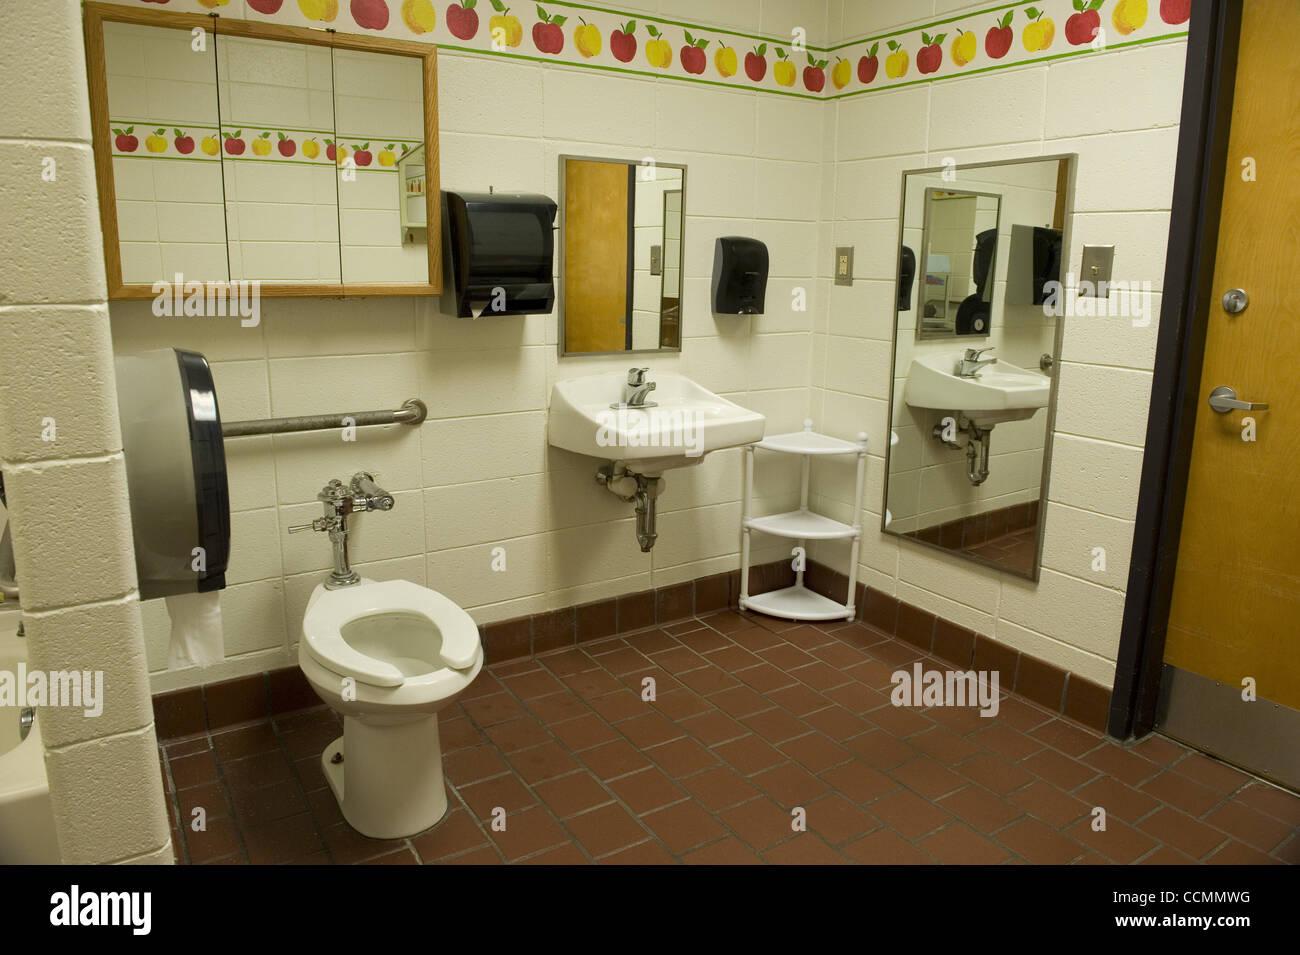 Elementary School Bathroom Design brilliant elementary school bathroom a superhero teaching rules